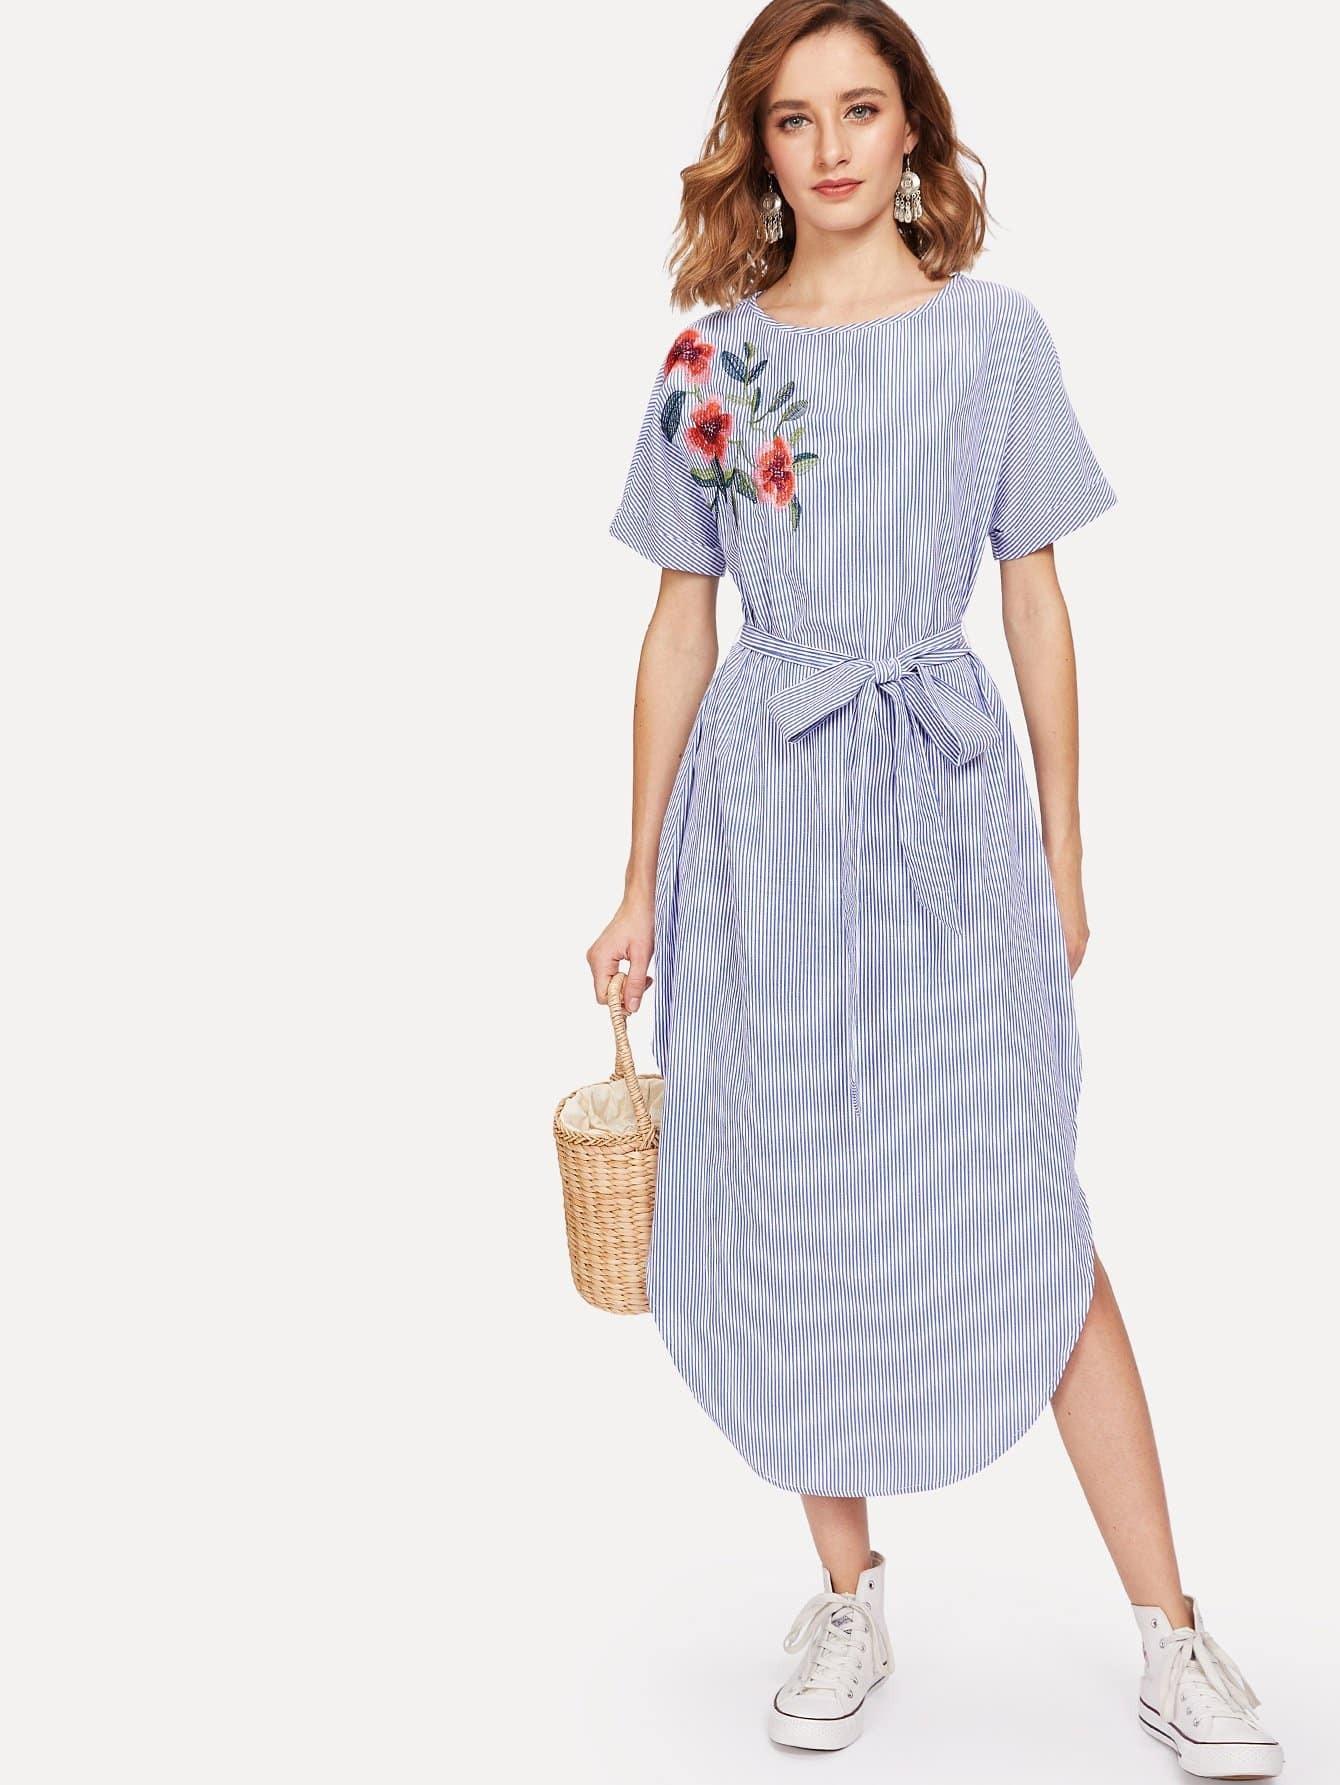 Flower Embroidered Belted Pinstripe Dress flounce hem belted pinstripe cami dress